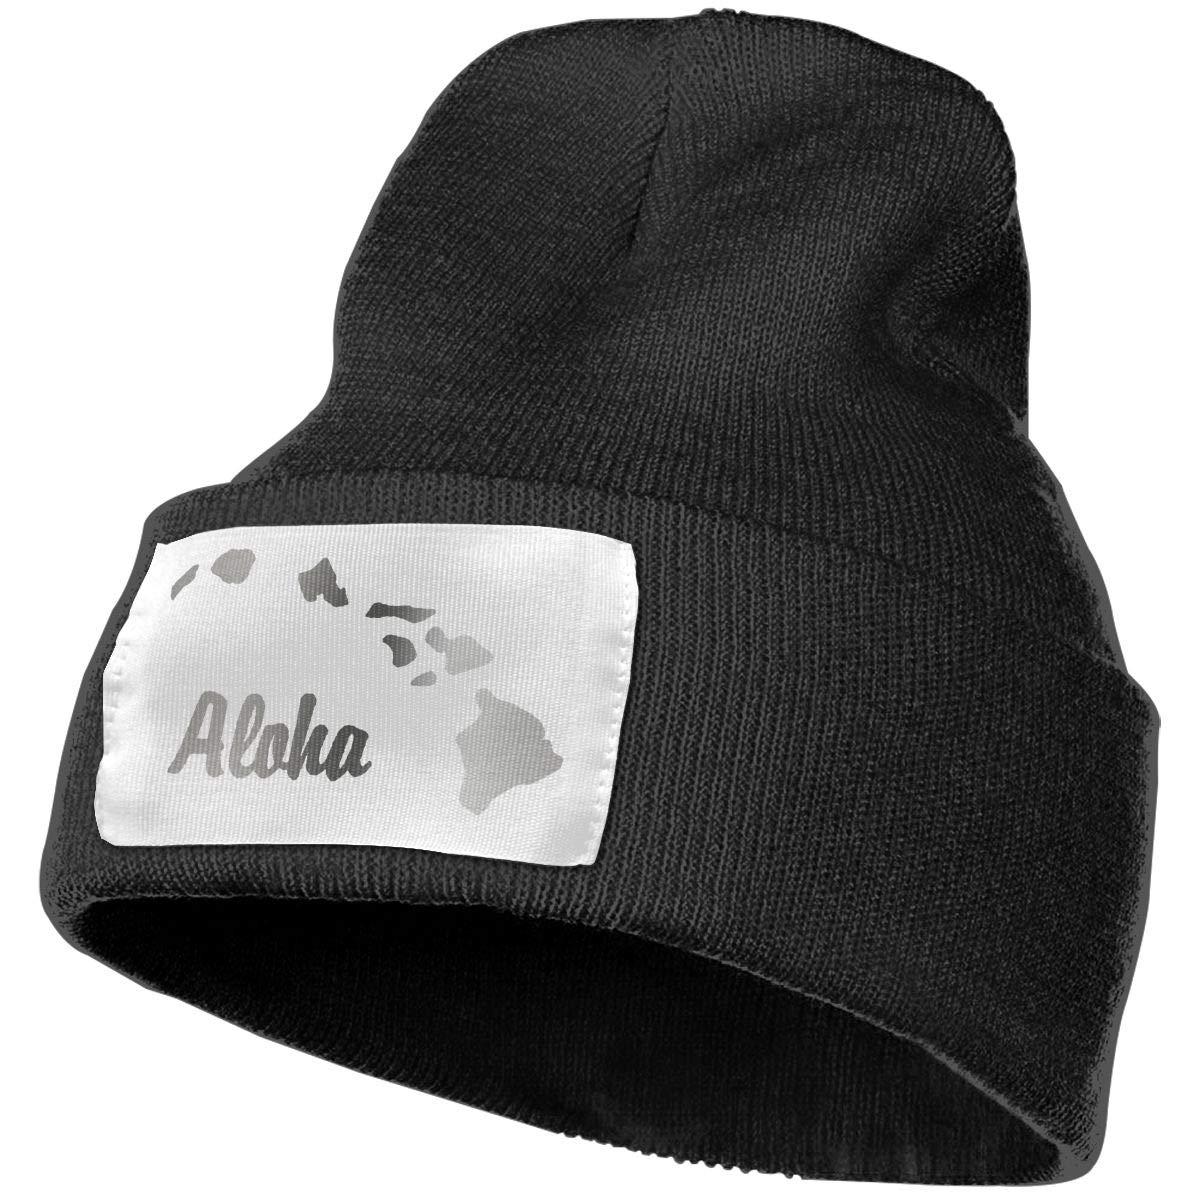 Adults Aloha Hawaiian Platinum Style Elastic Knitted Beanie Cap Winter Warm Skull Hats